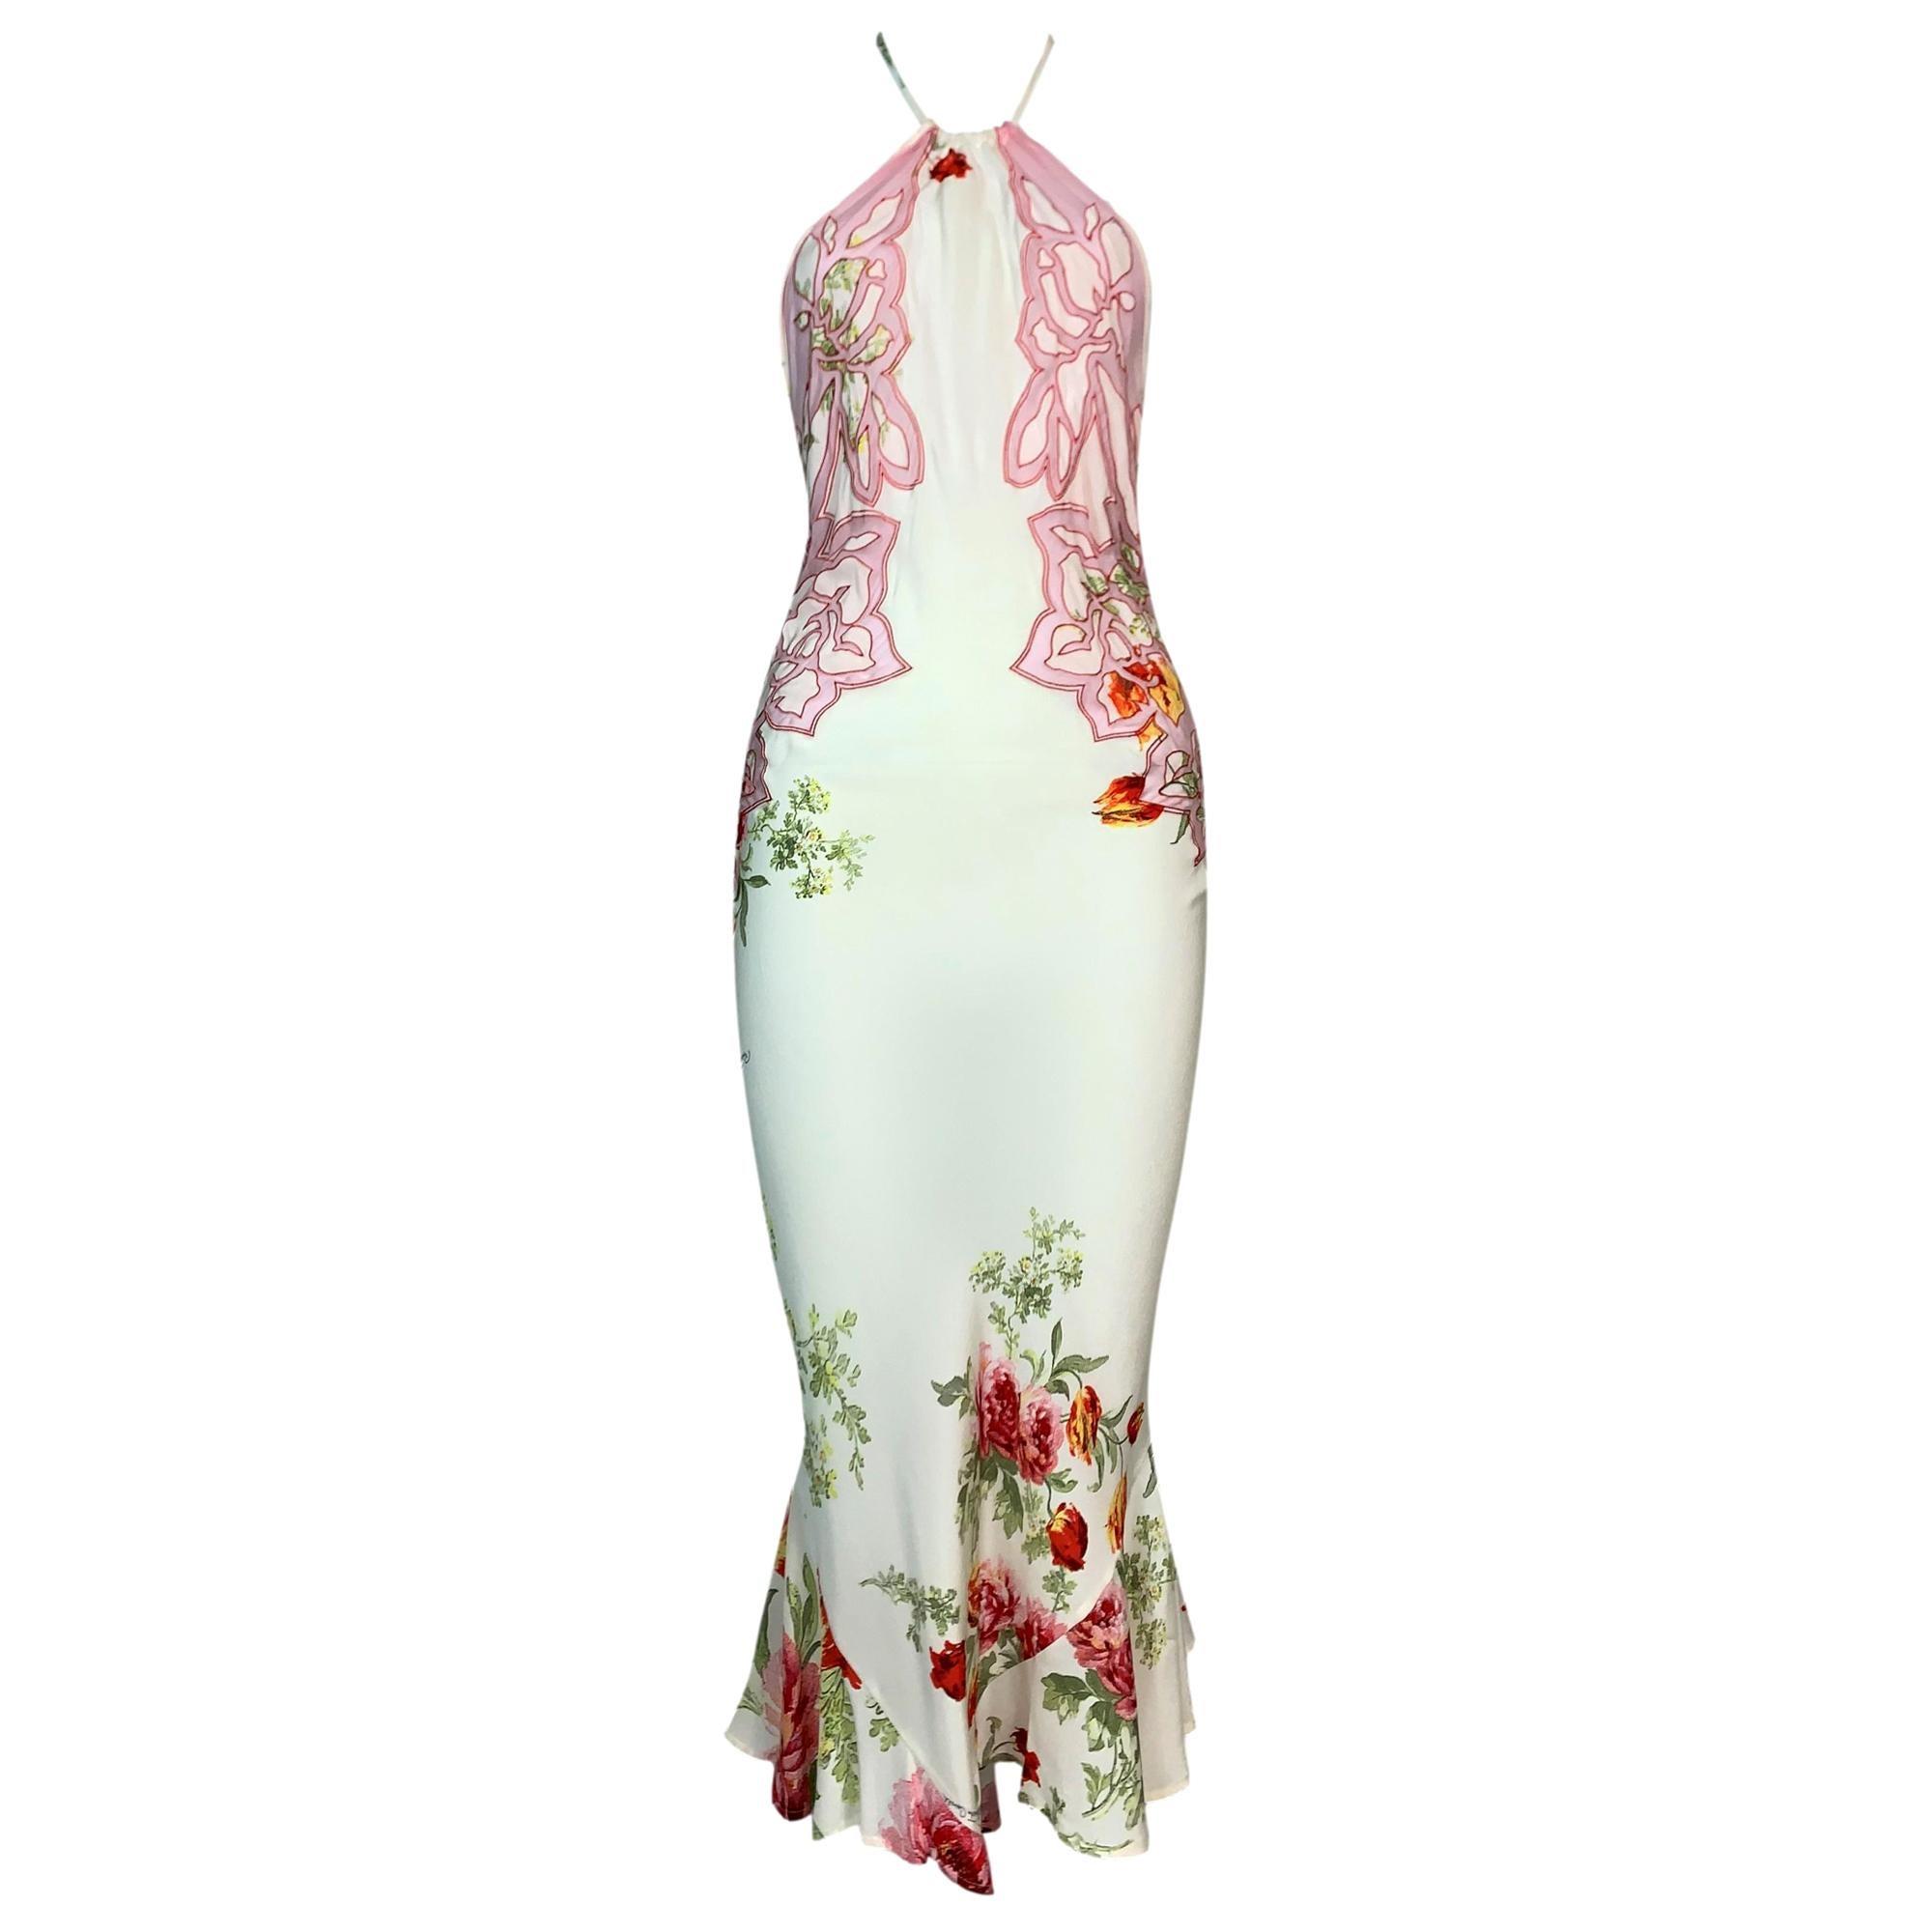 S/S 2002 Roberto Cavalli Sheer Ivory Floral Silk Tattoo Backless Dress